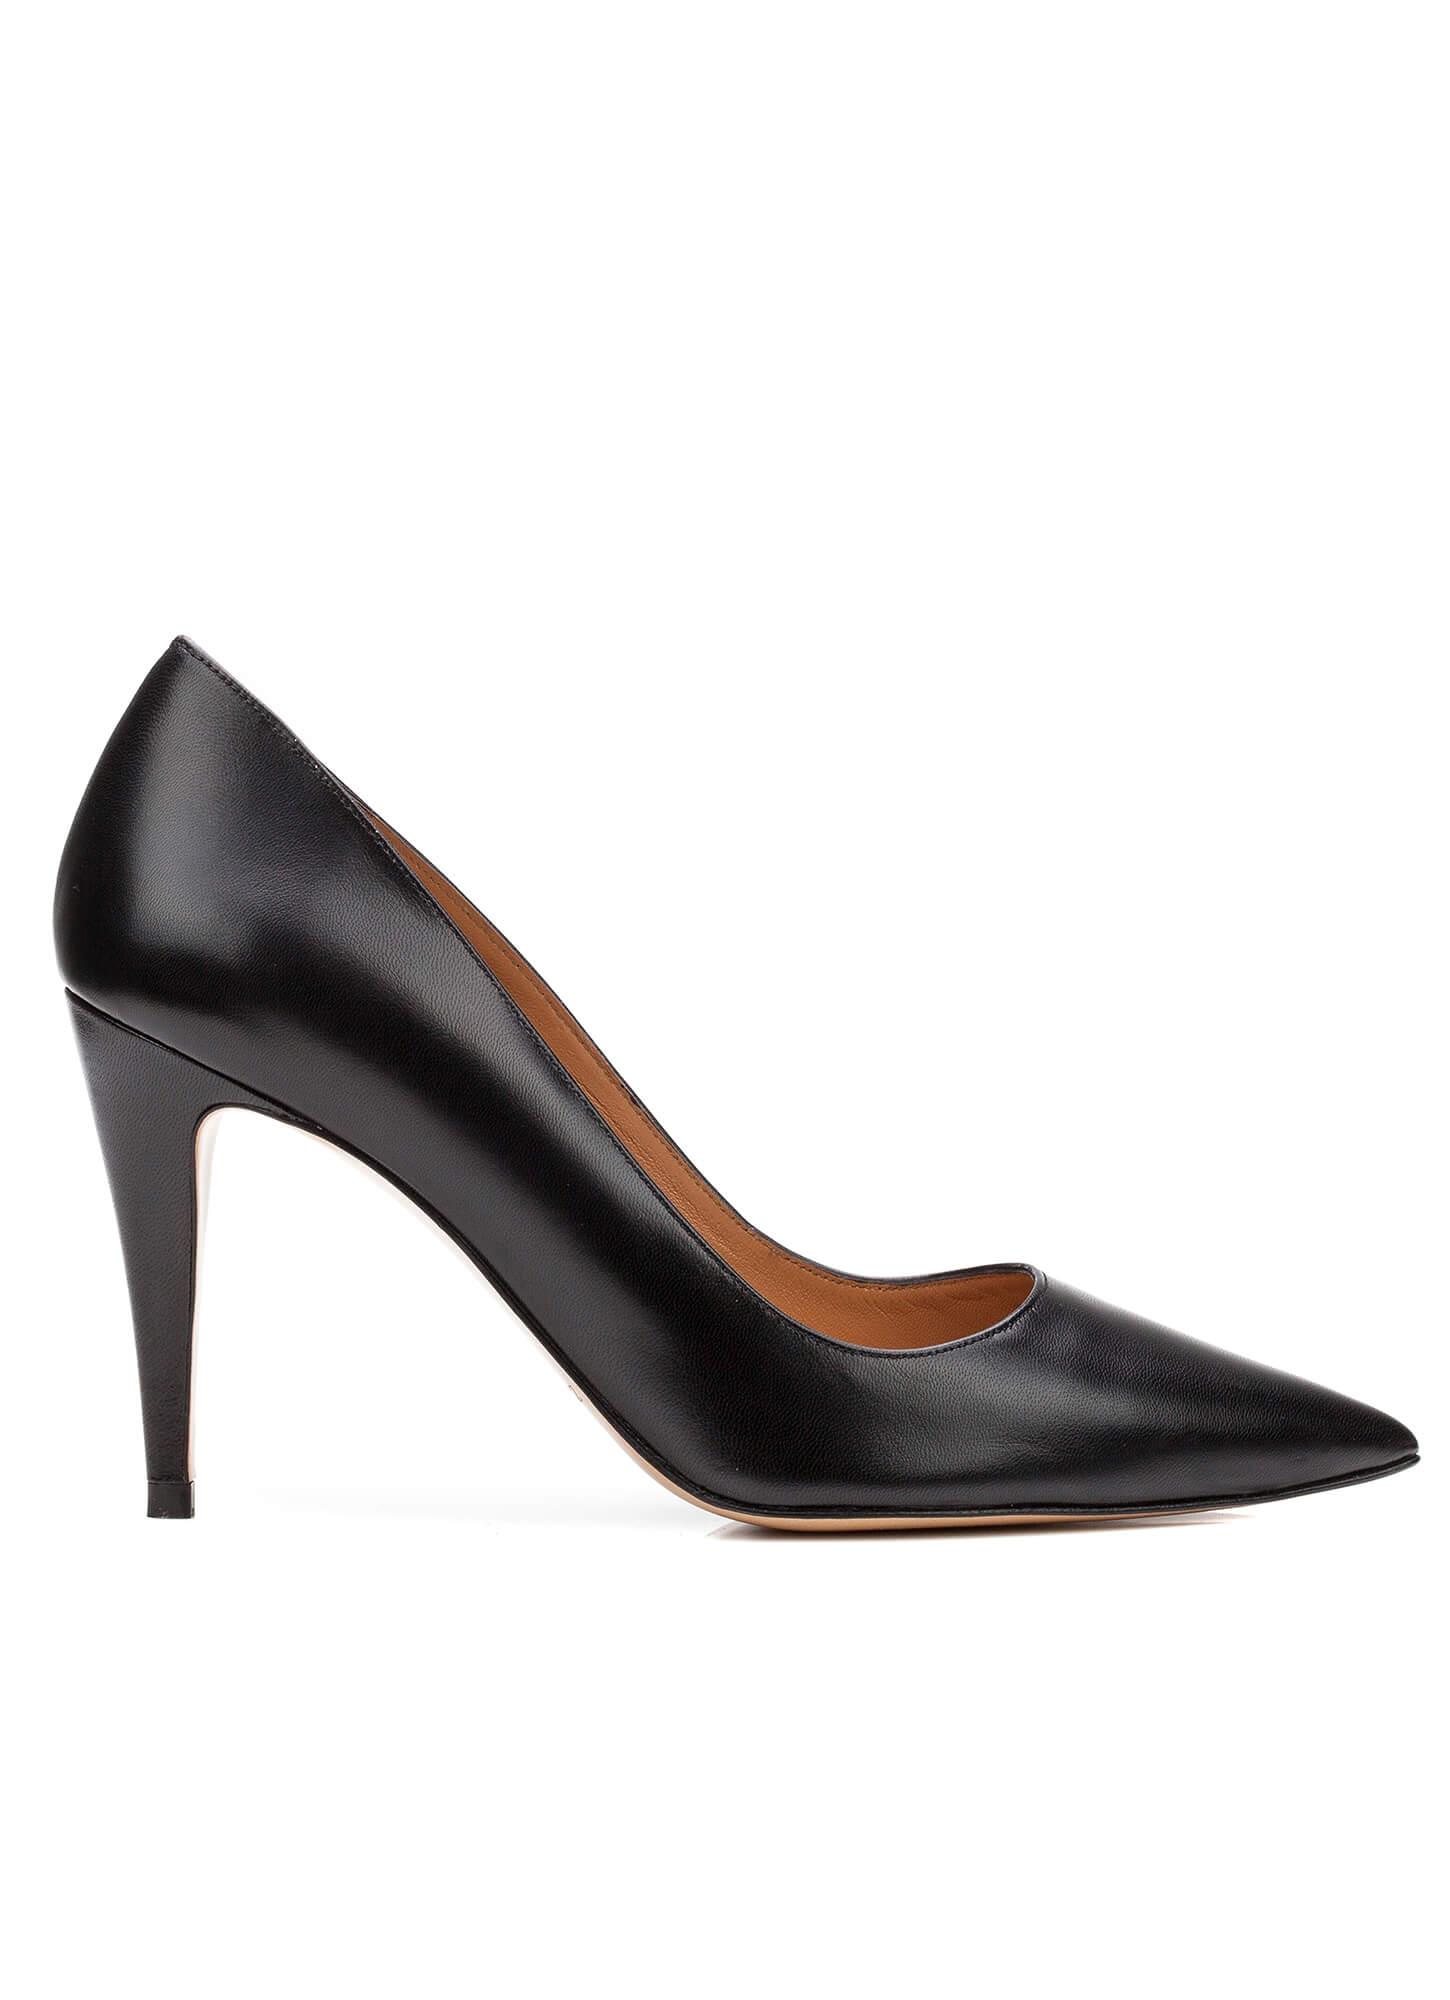 San Marina Zapatos De Tacón Castilla De Piel Negro Tacón: 6 cm X5S2lS